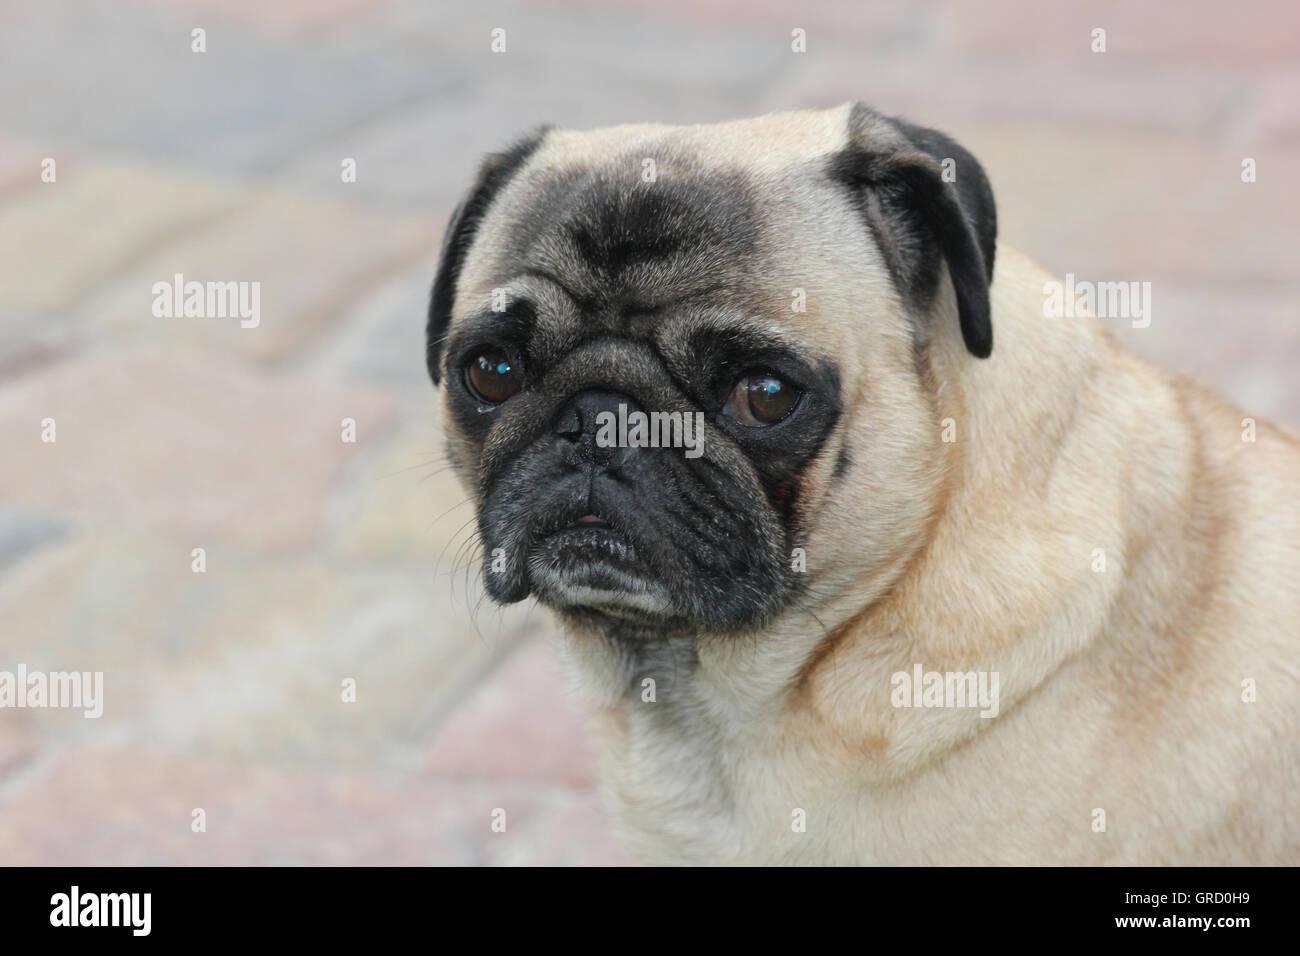 Beige Pug Looking Melancholically - Stock Image